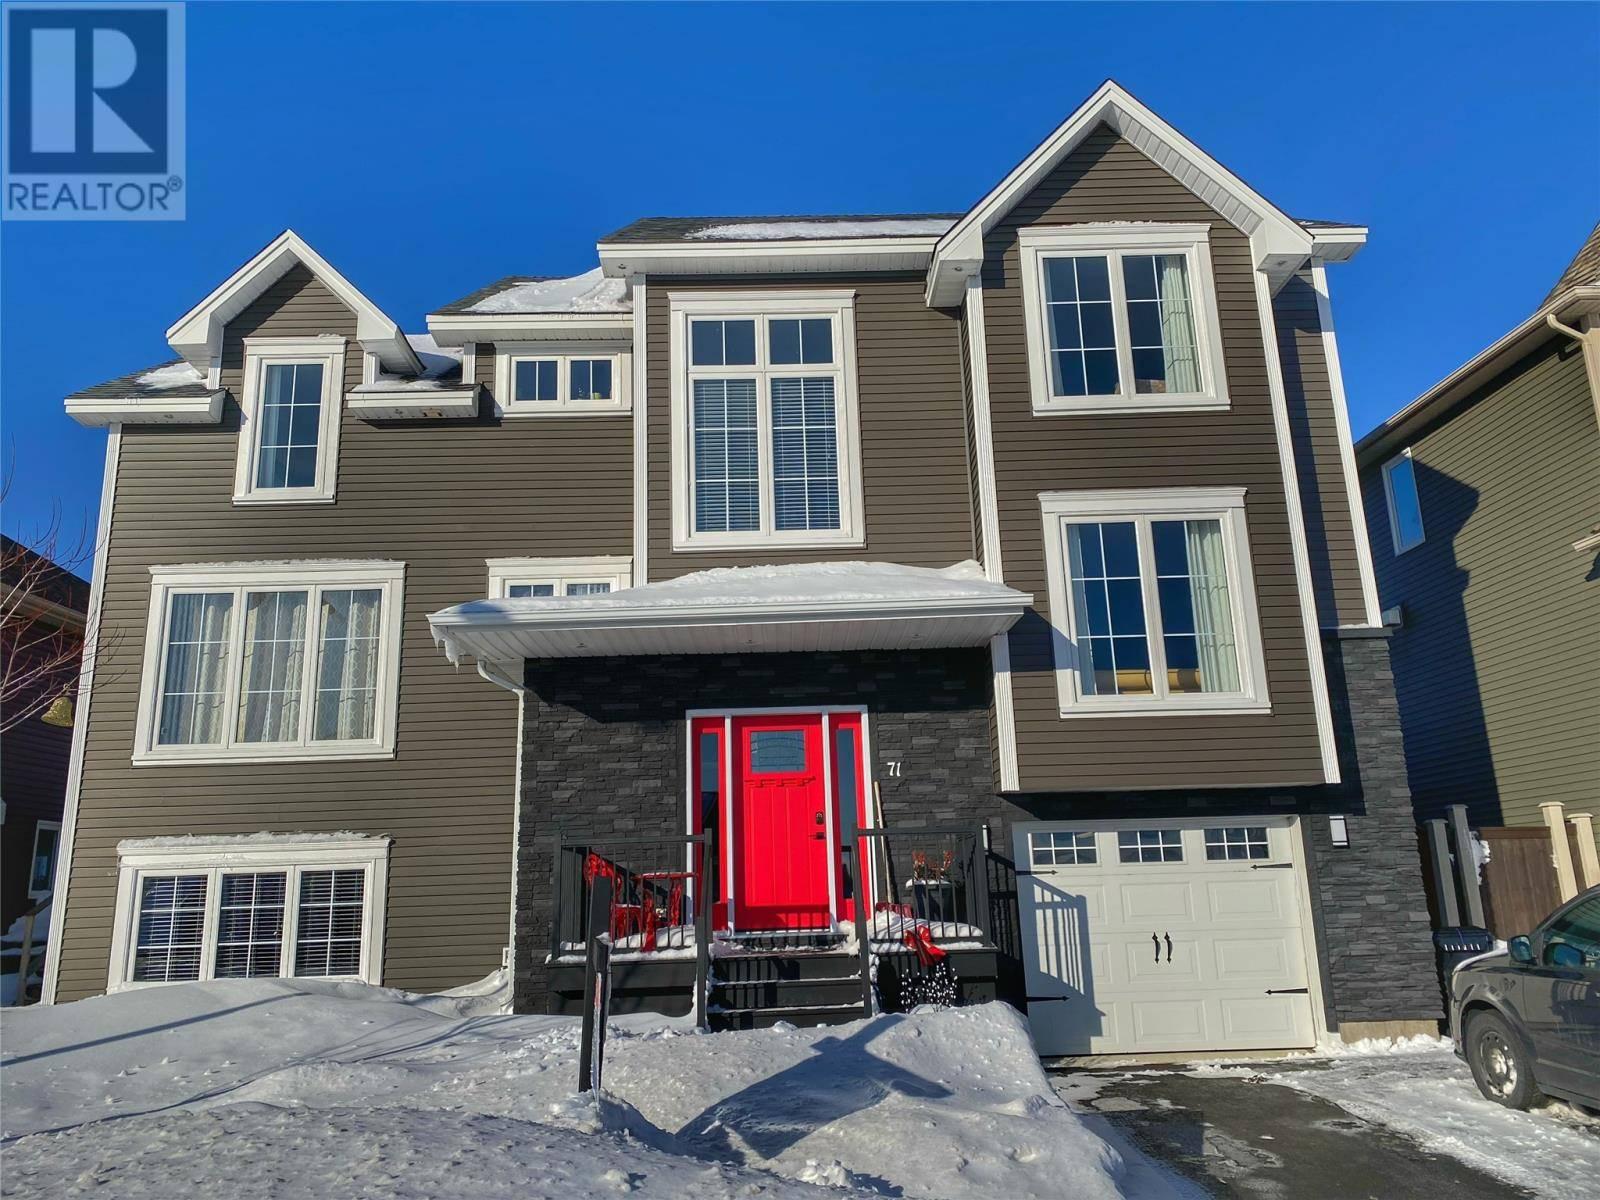 House for sale at 71 Julieann Pl St. John's Newfoundland - MLS: 1203151